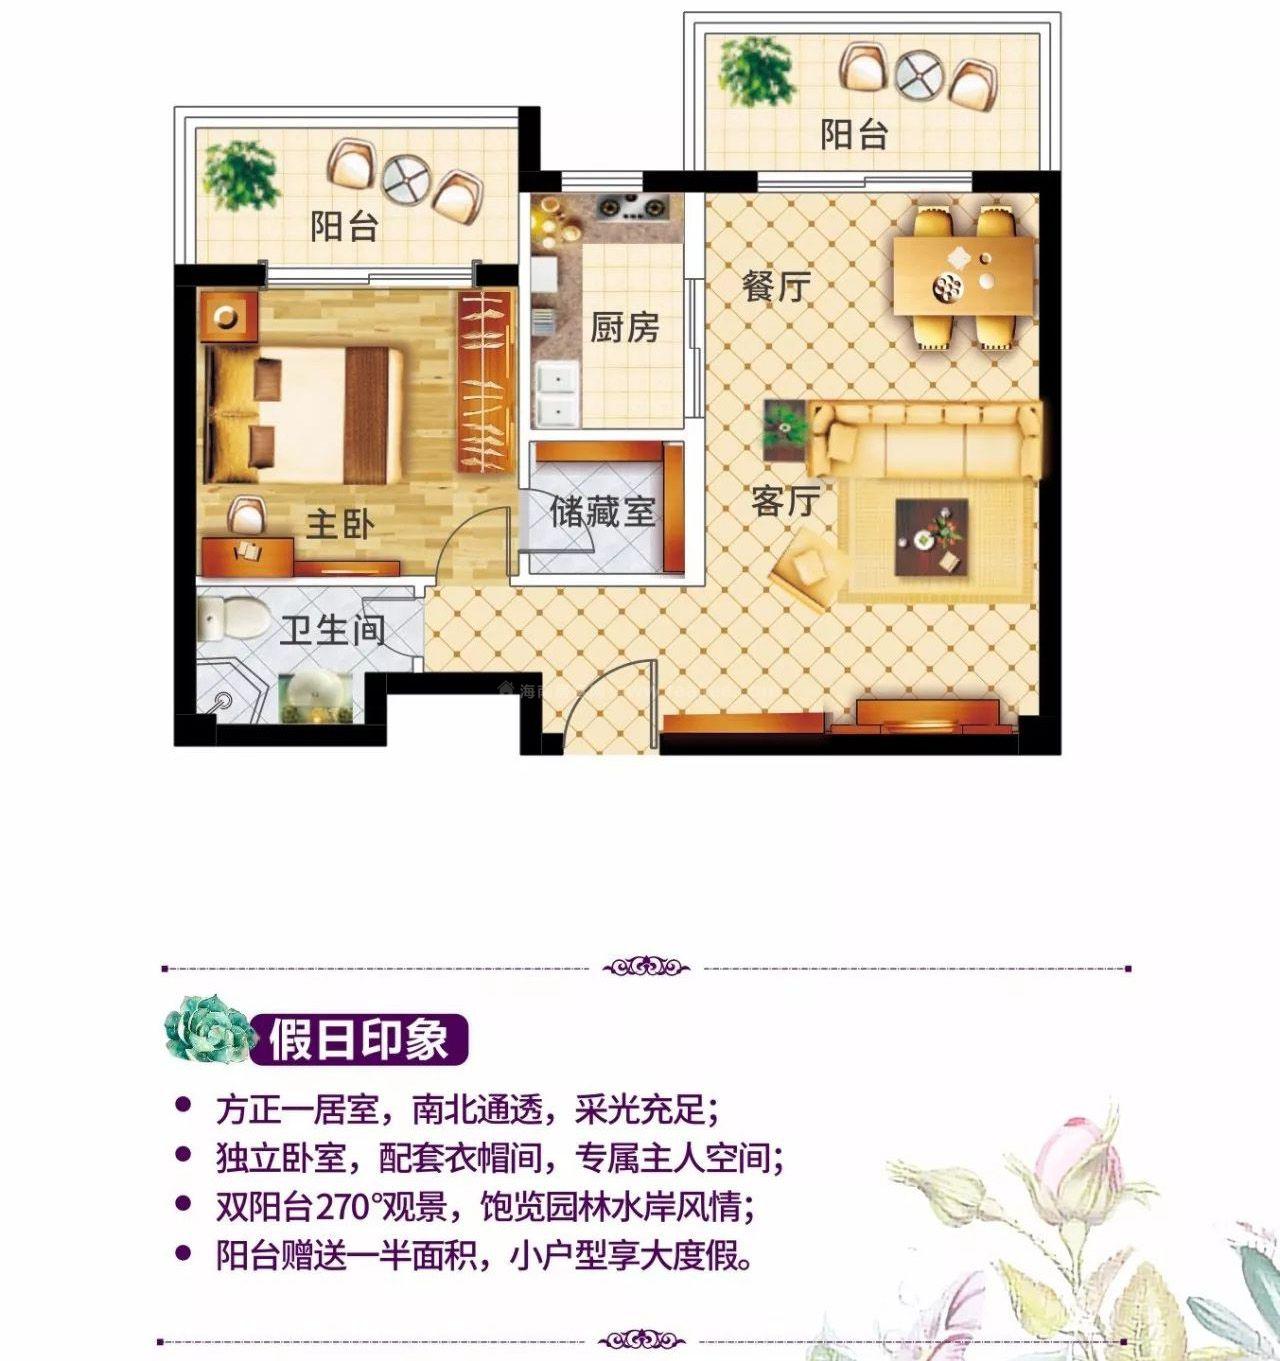 B户型 1房2厅1卫 建筑面积约68.88平